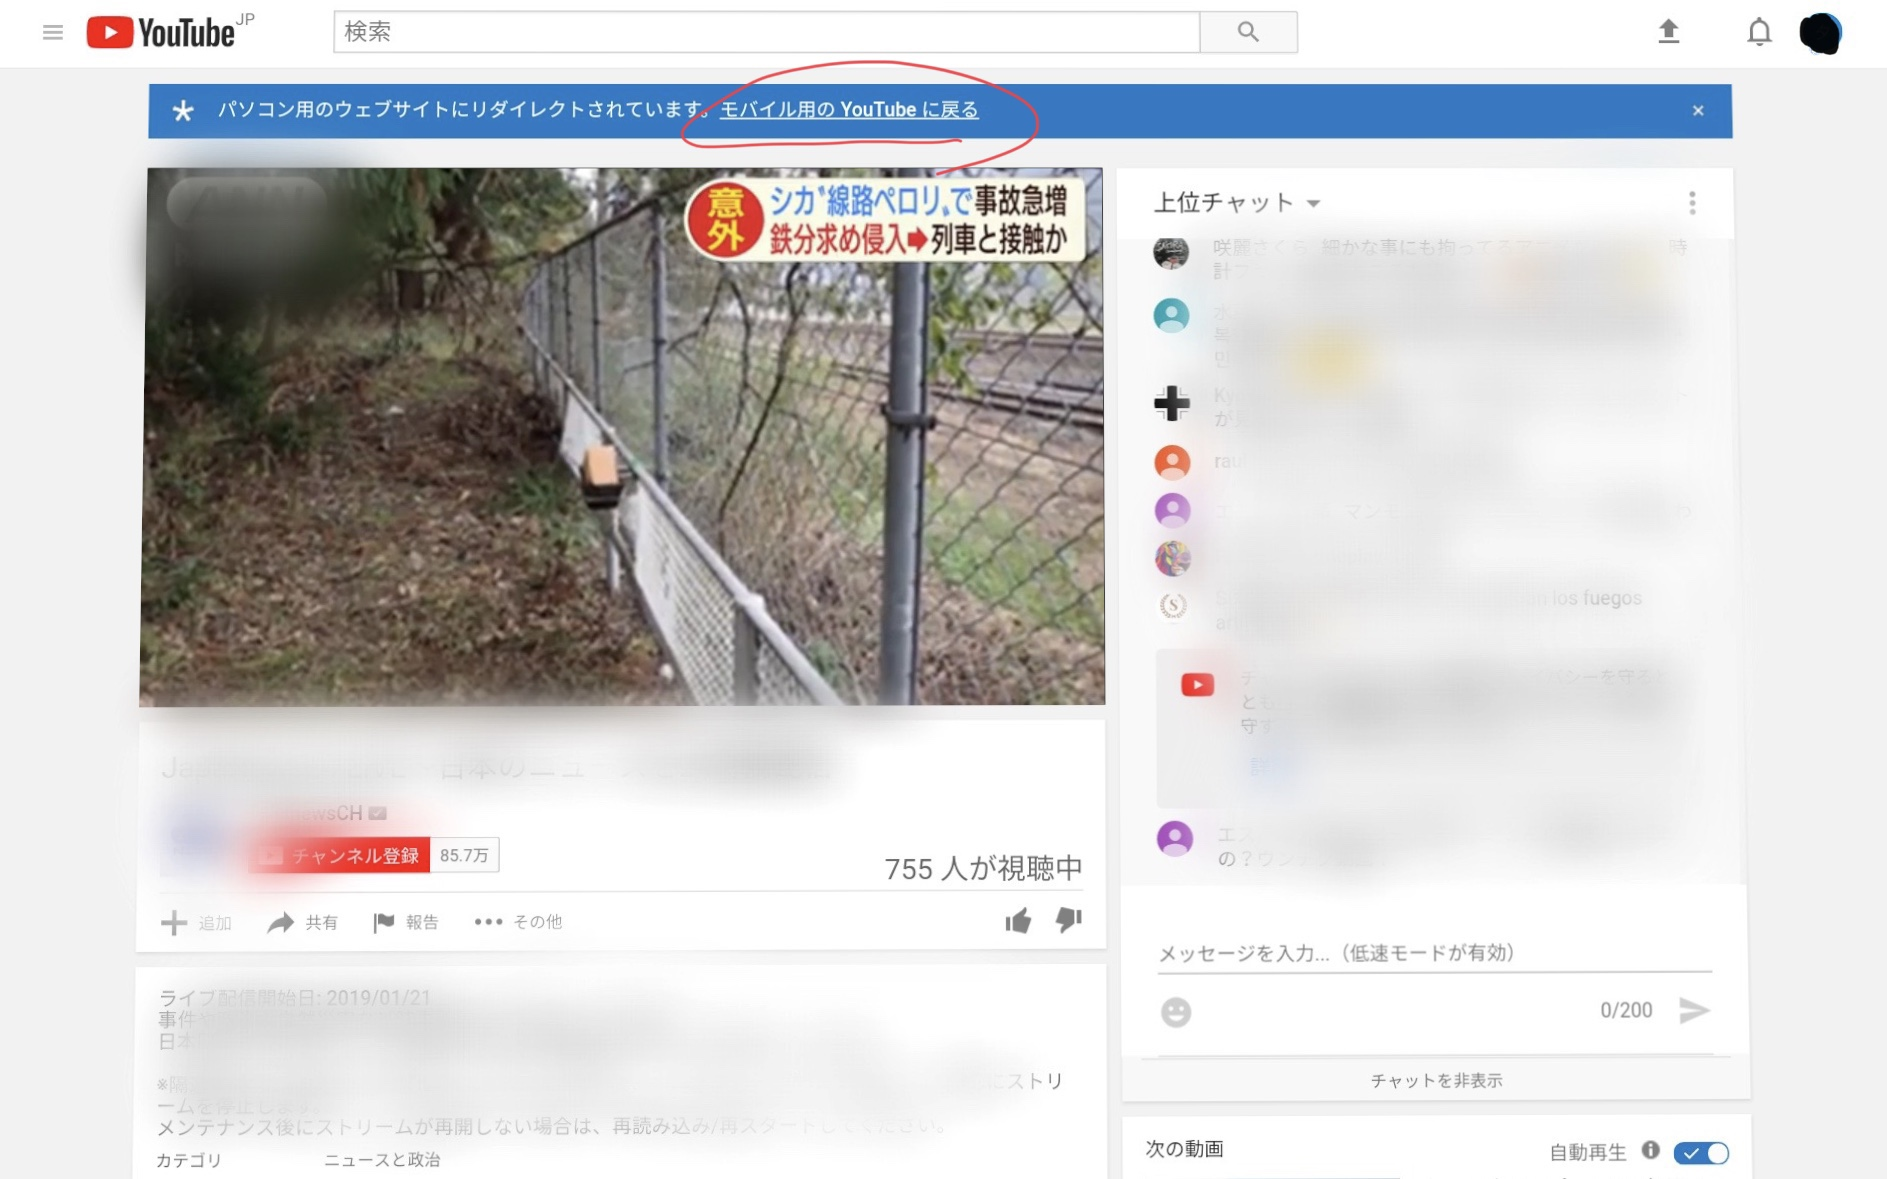 YouTube パソコン版 チャット